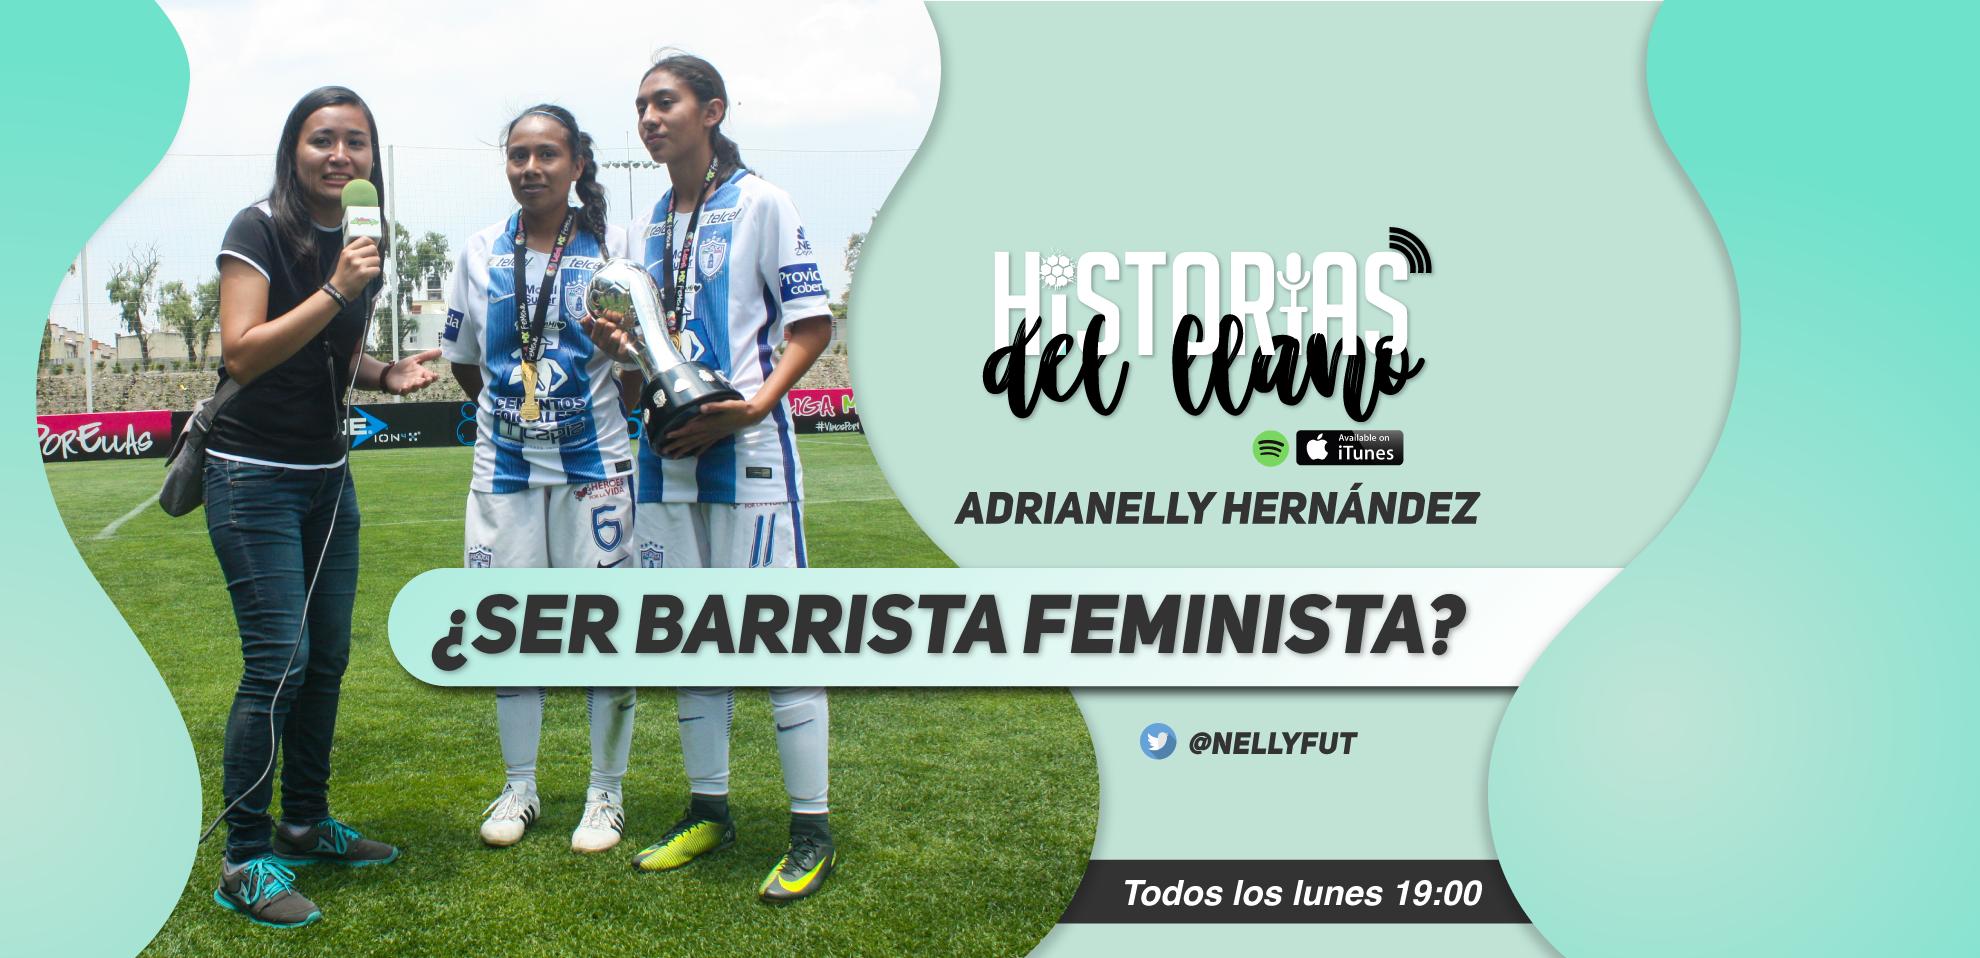 Adrianelly Hernández